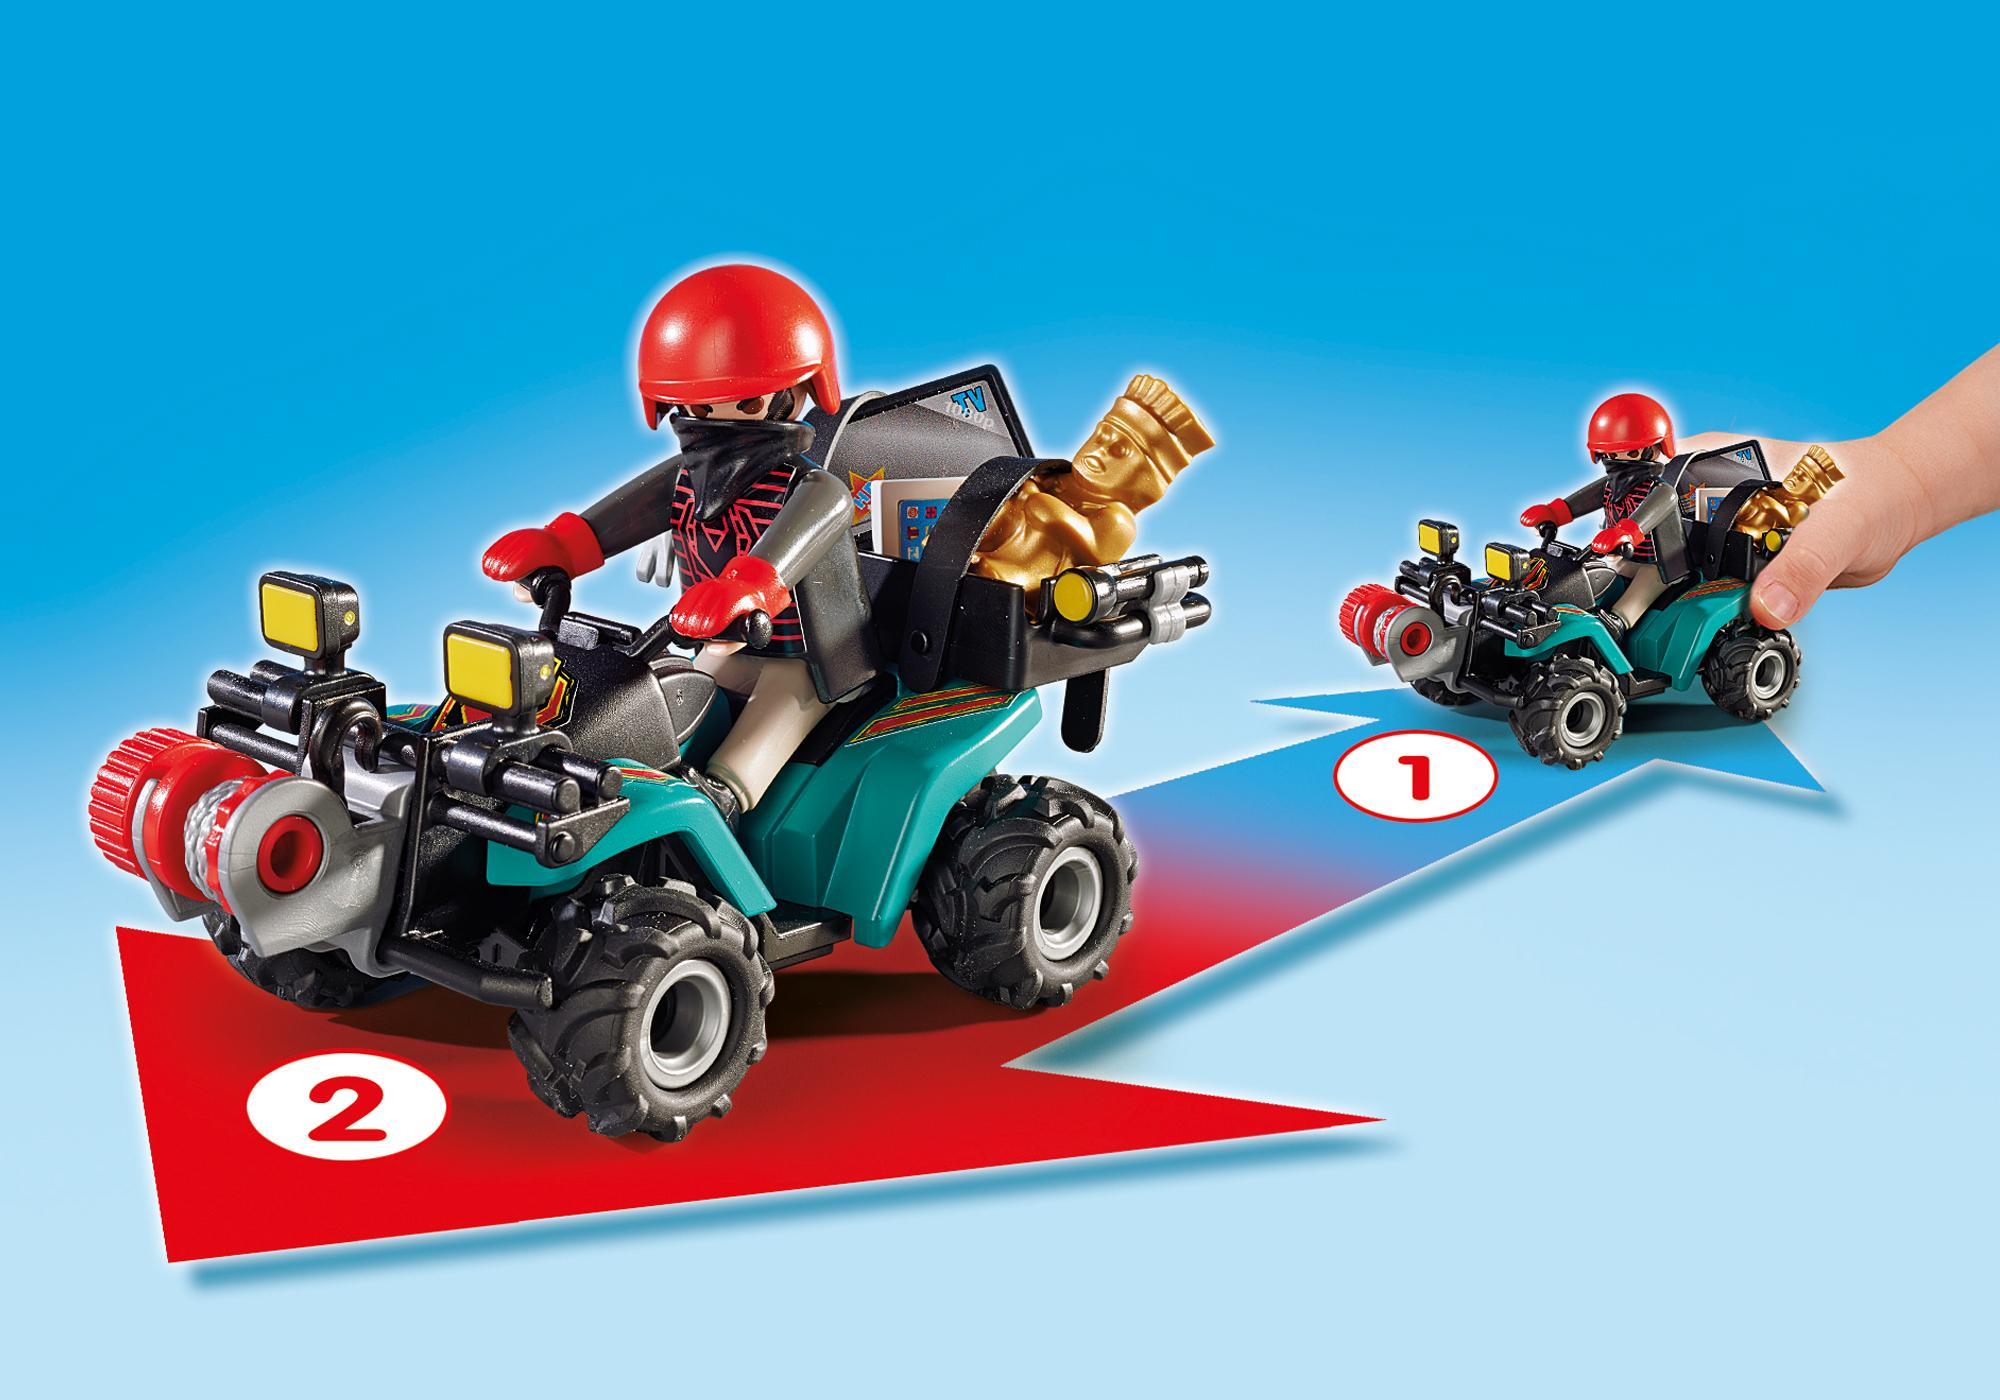 http://media.playmobil.com/i/playmobil/6879_product_extra1